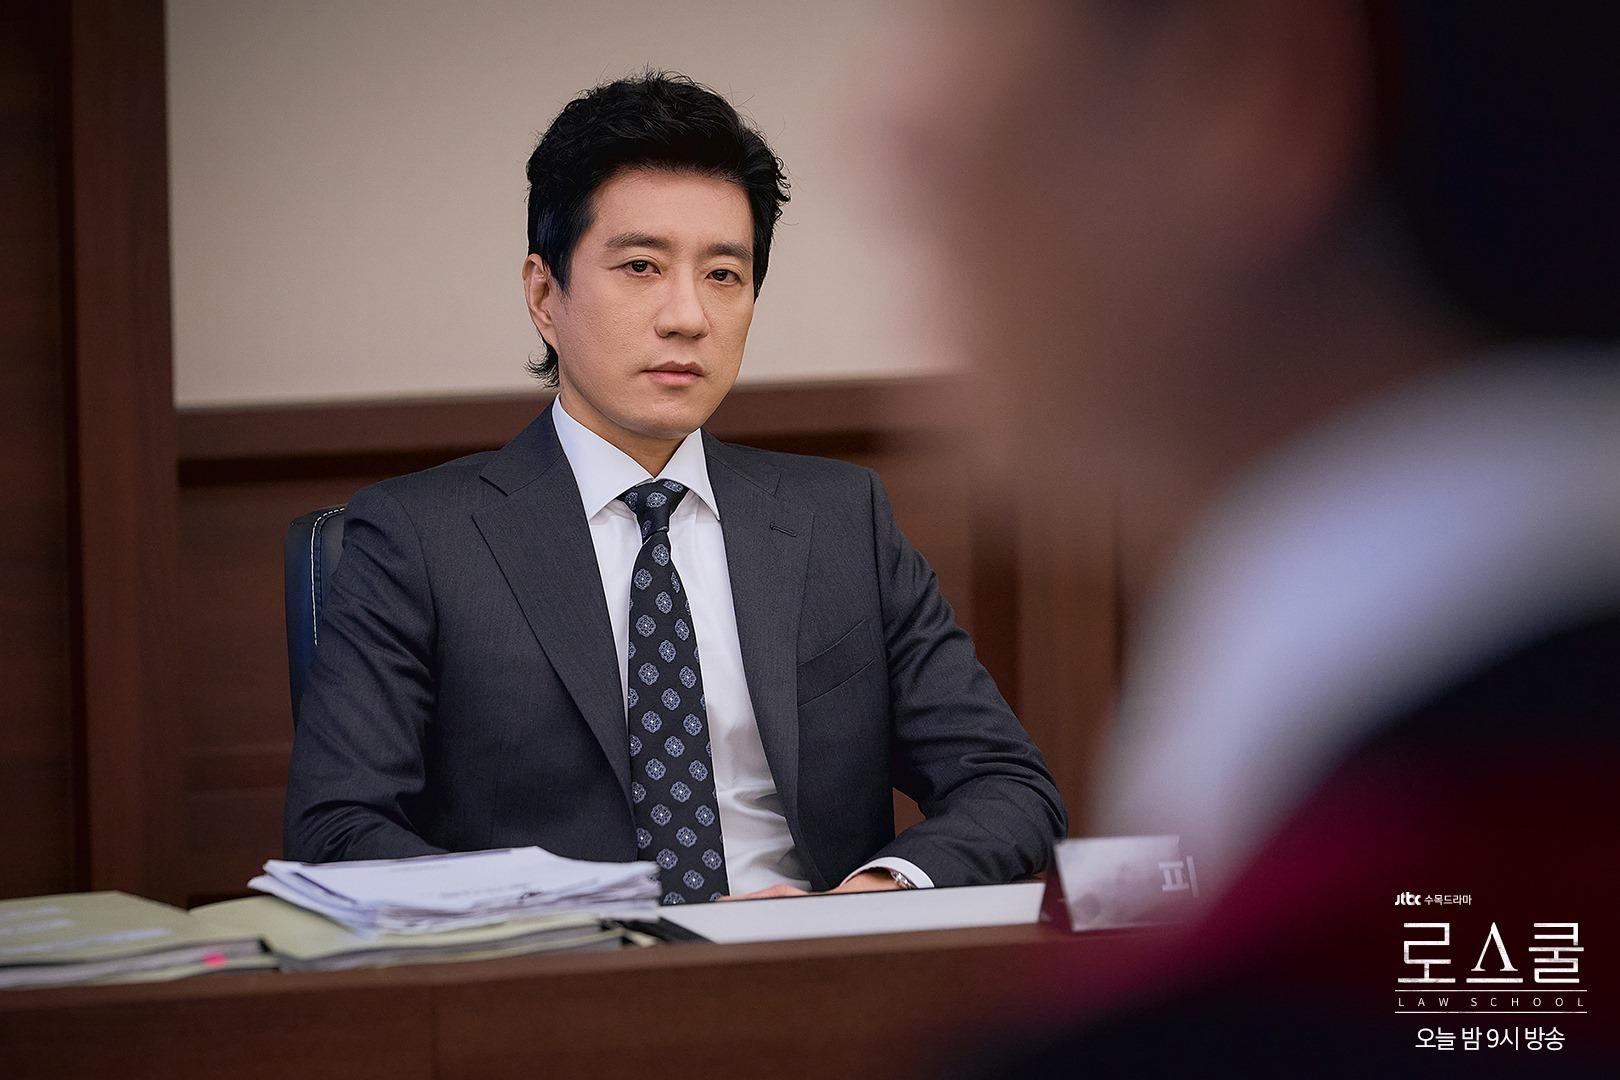 Myung-Min Kim in Law School (2021)